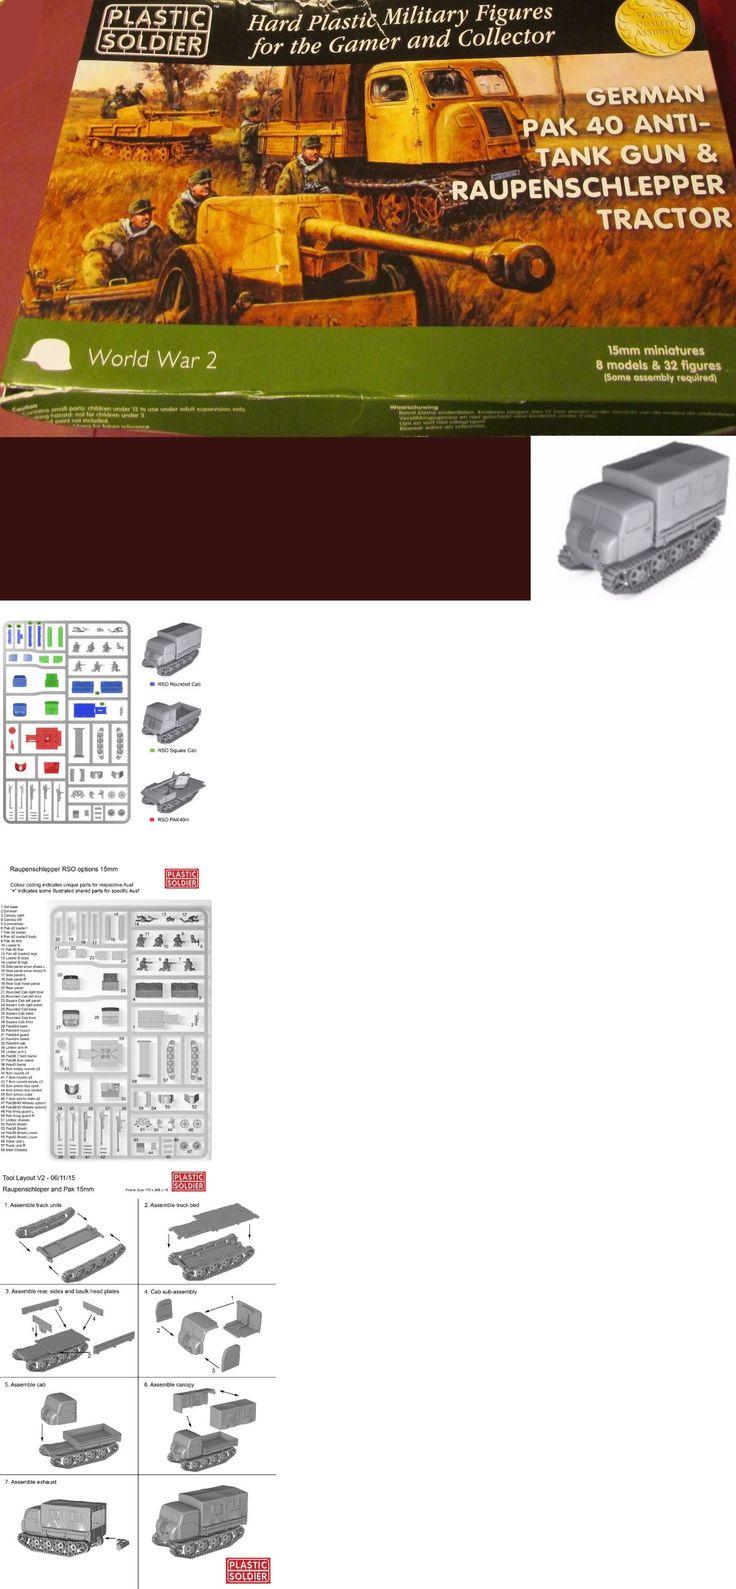 15mm 158728: Plastic Soldier Company Ww2g15004 15Mm Wwii German Pak 40 Anti-Tank Gun Tractor -> BUY IT NOW ONLY: $30.83 on eBay!